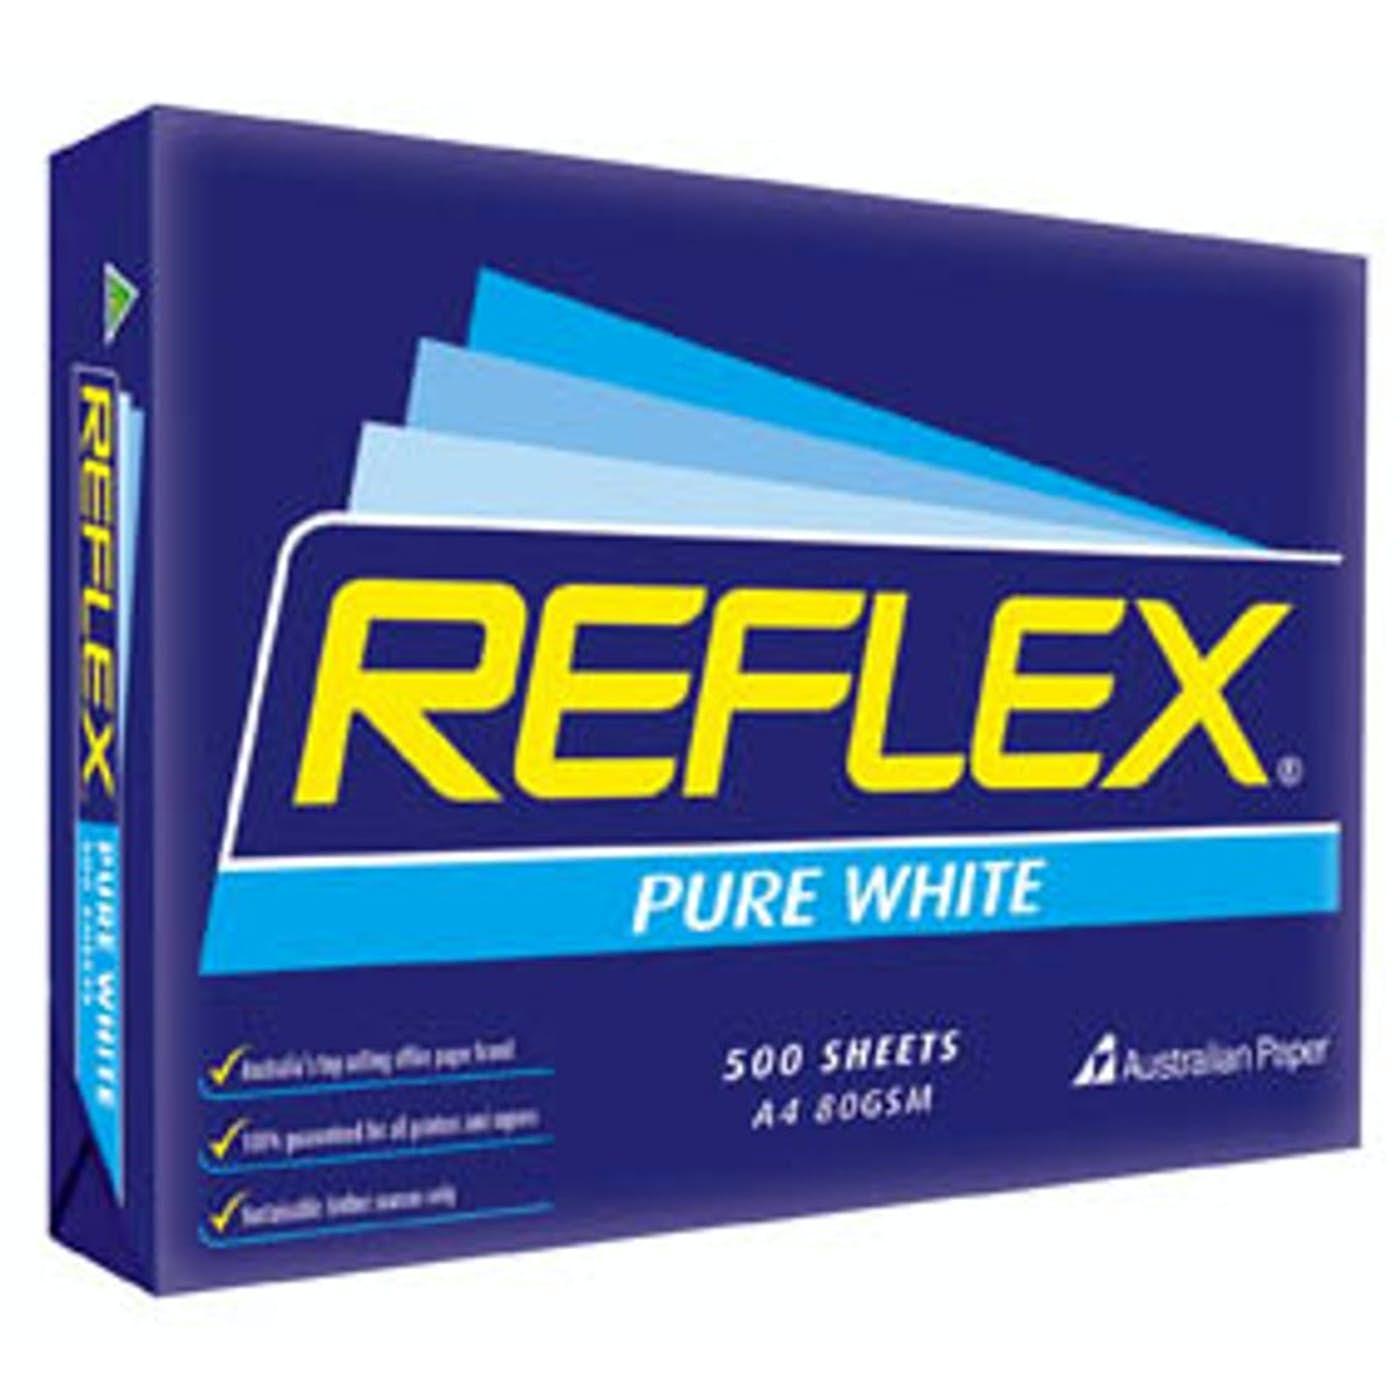 REFLEX A4 WHITE COPY PAPER